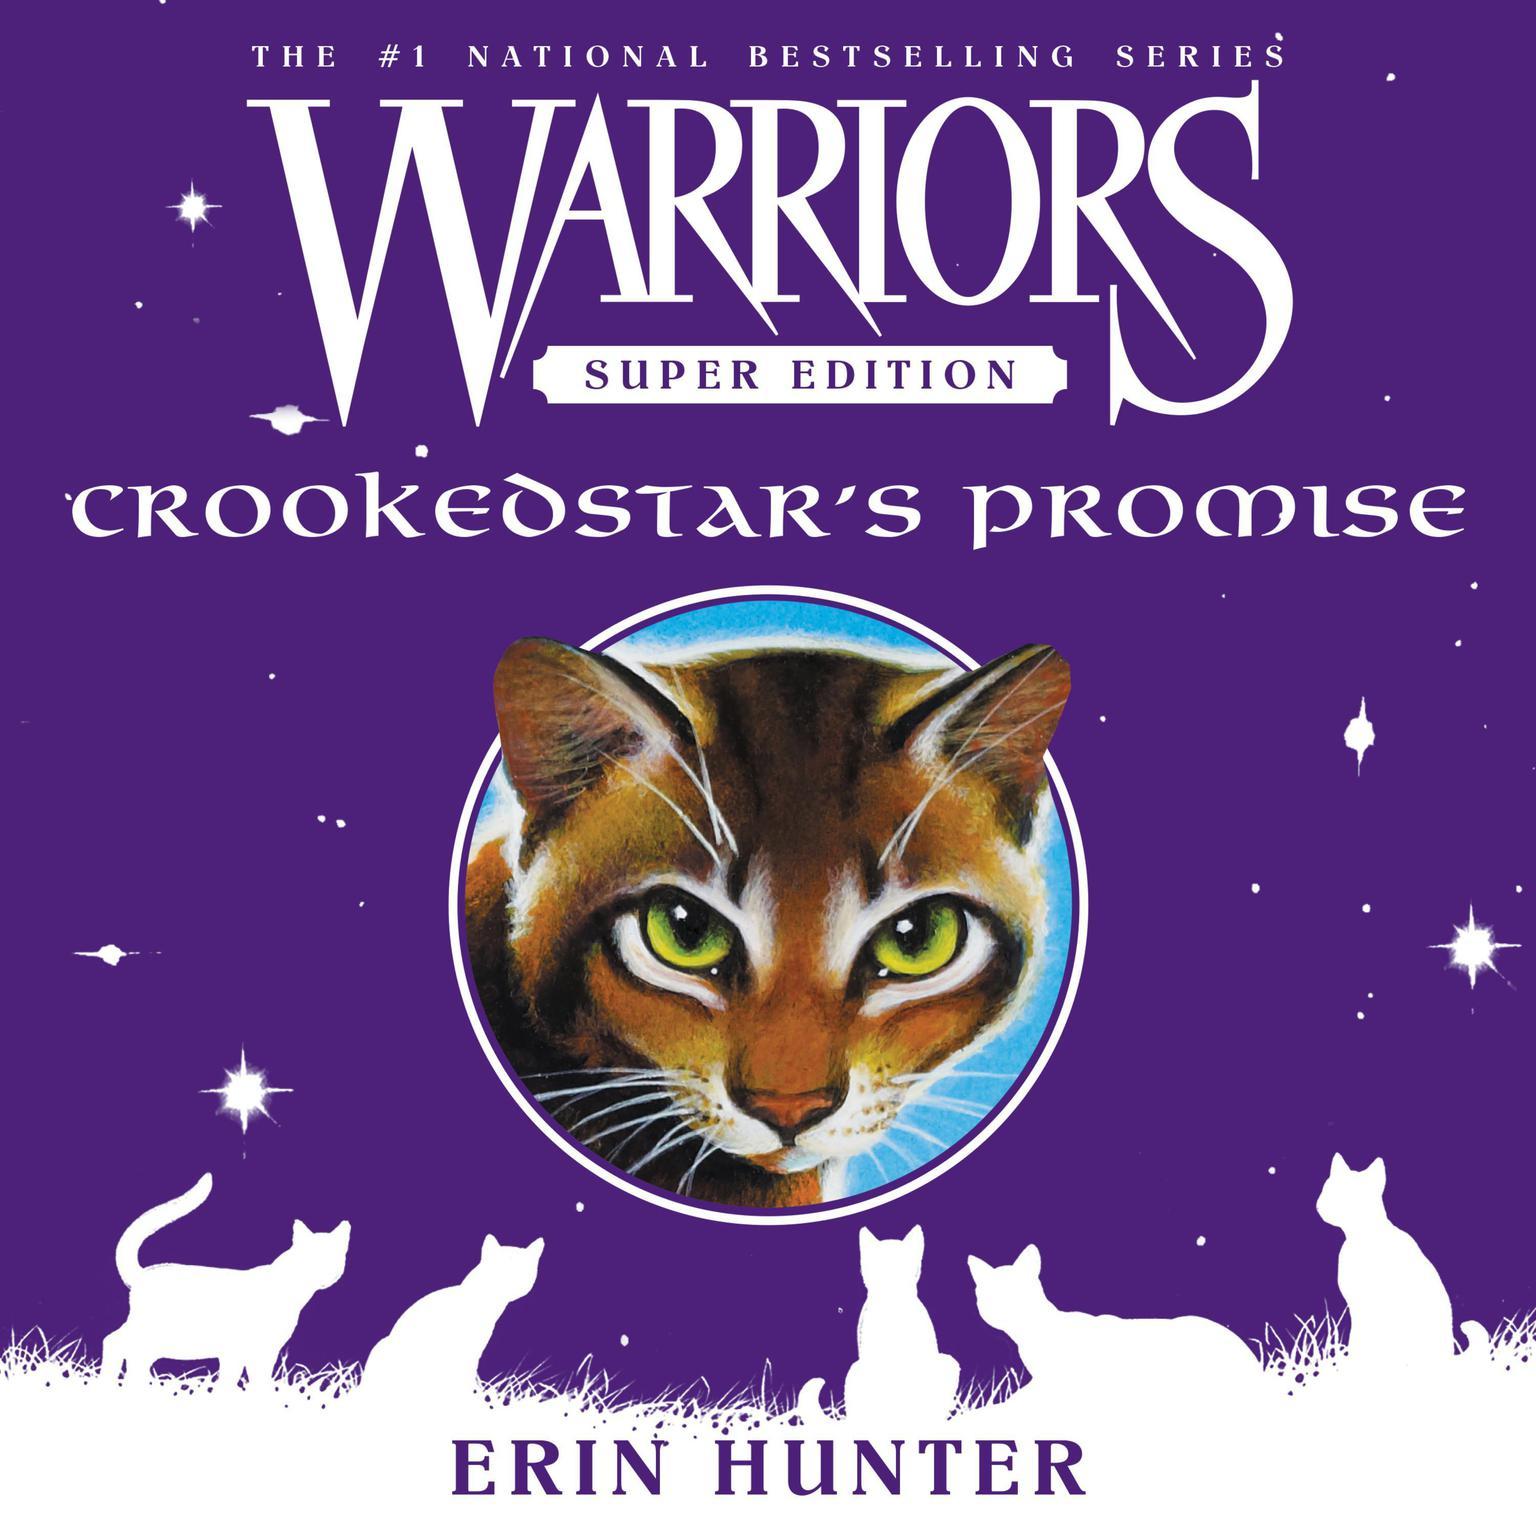 Warriors Super Edition: Crookedstars Promise Audiobook, by Erin Hunter